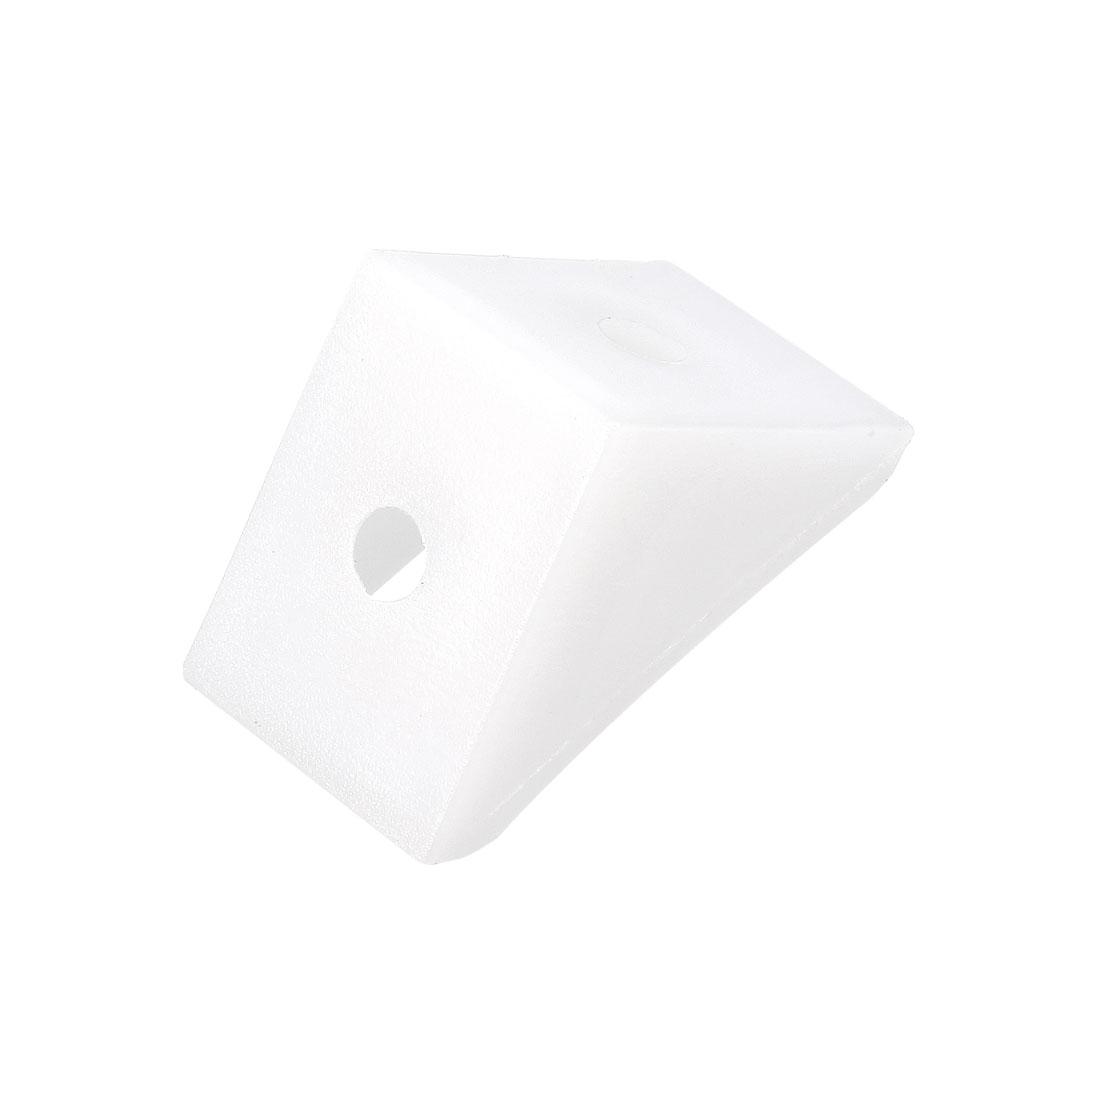 Shelf Cabinet Door 90 Degree Plastic Corner Braces 2 Holes Angle Bracket, 50 Pcs